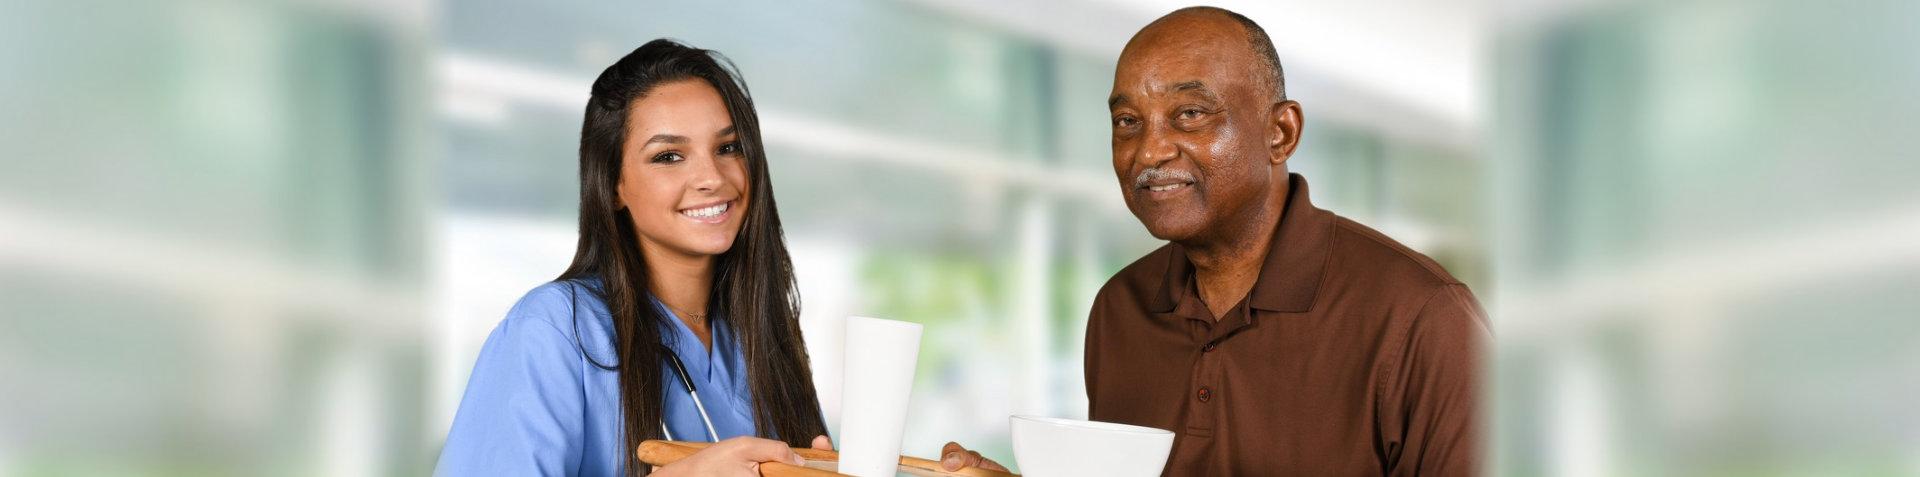 caretaker and old man smiling